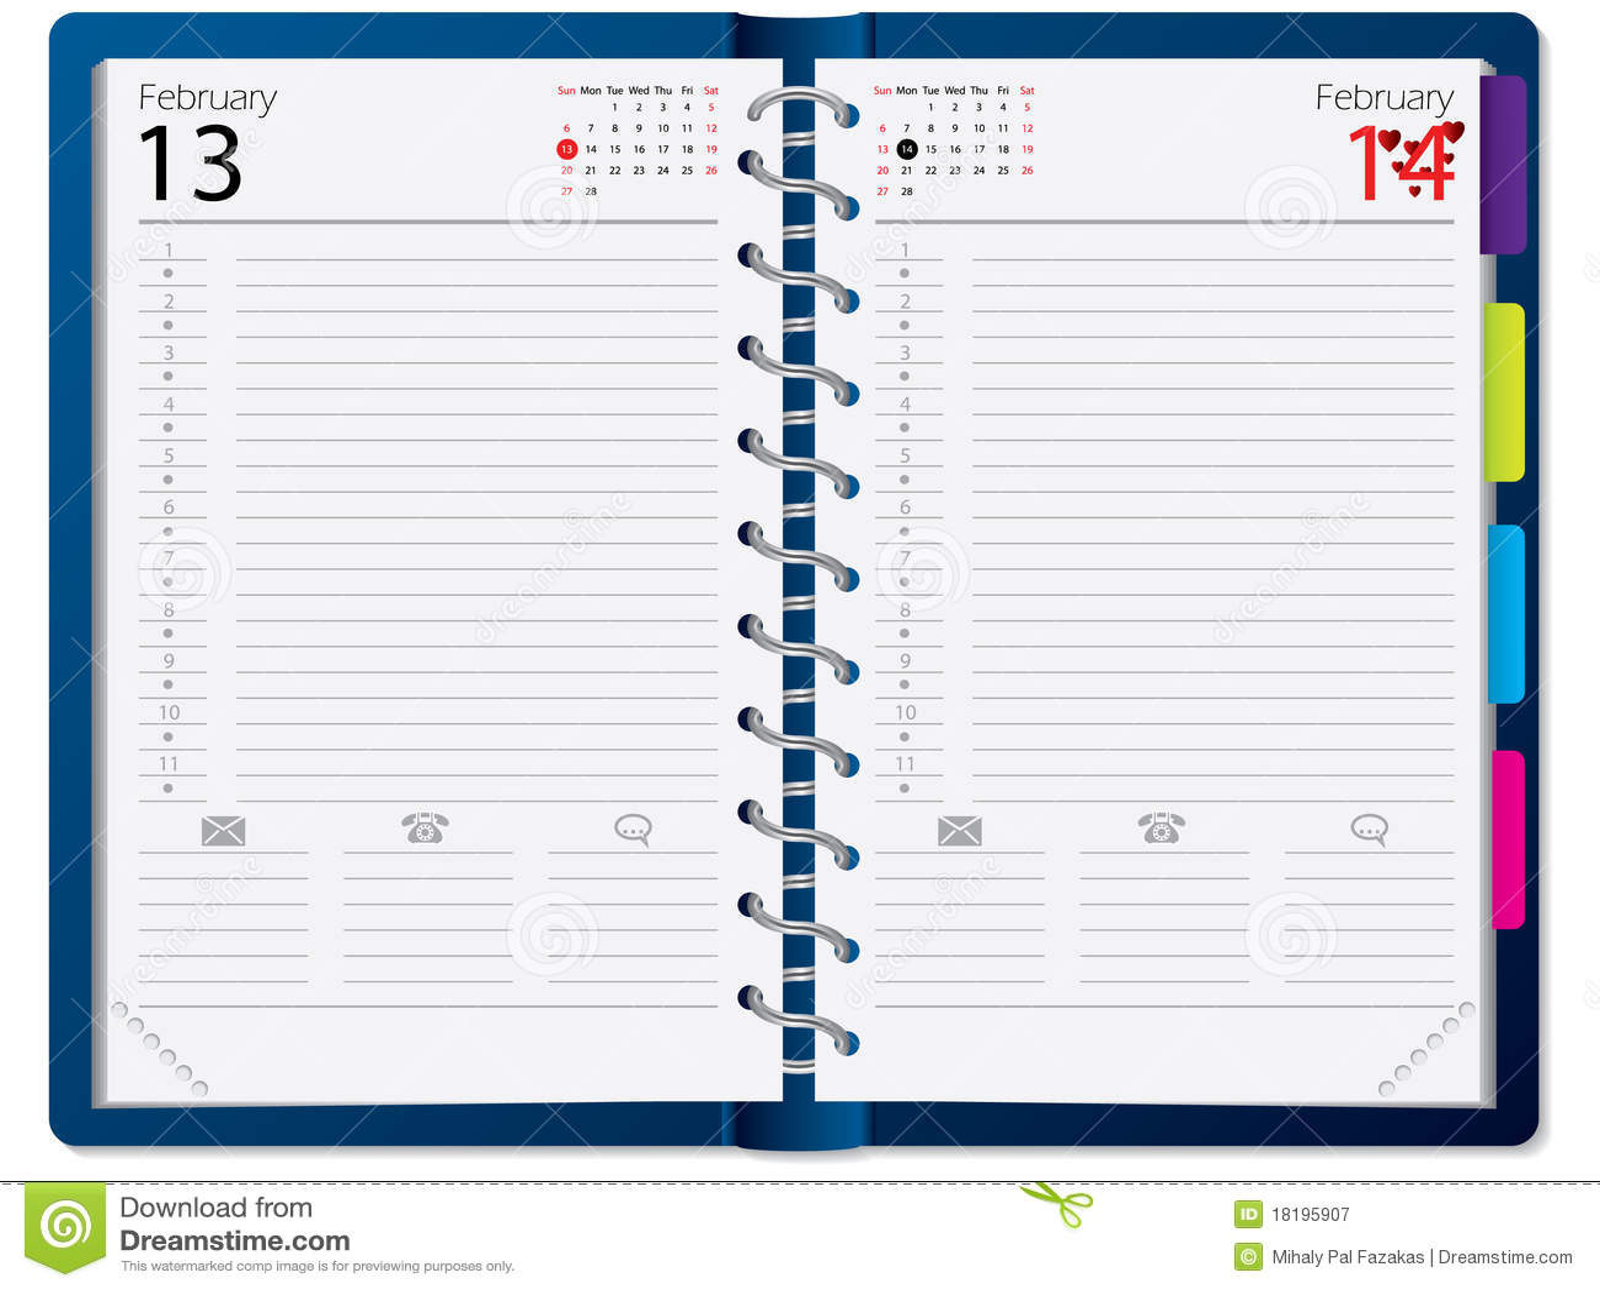 Calendar Notebook Design : Notebook design with calendar royalty free stock